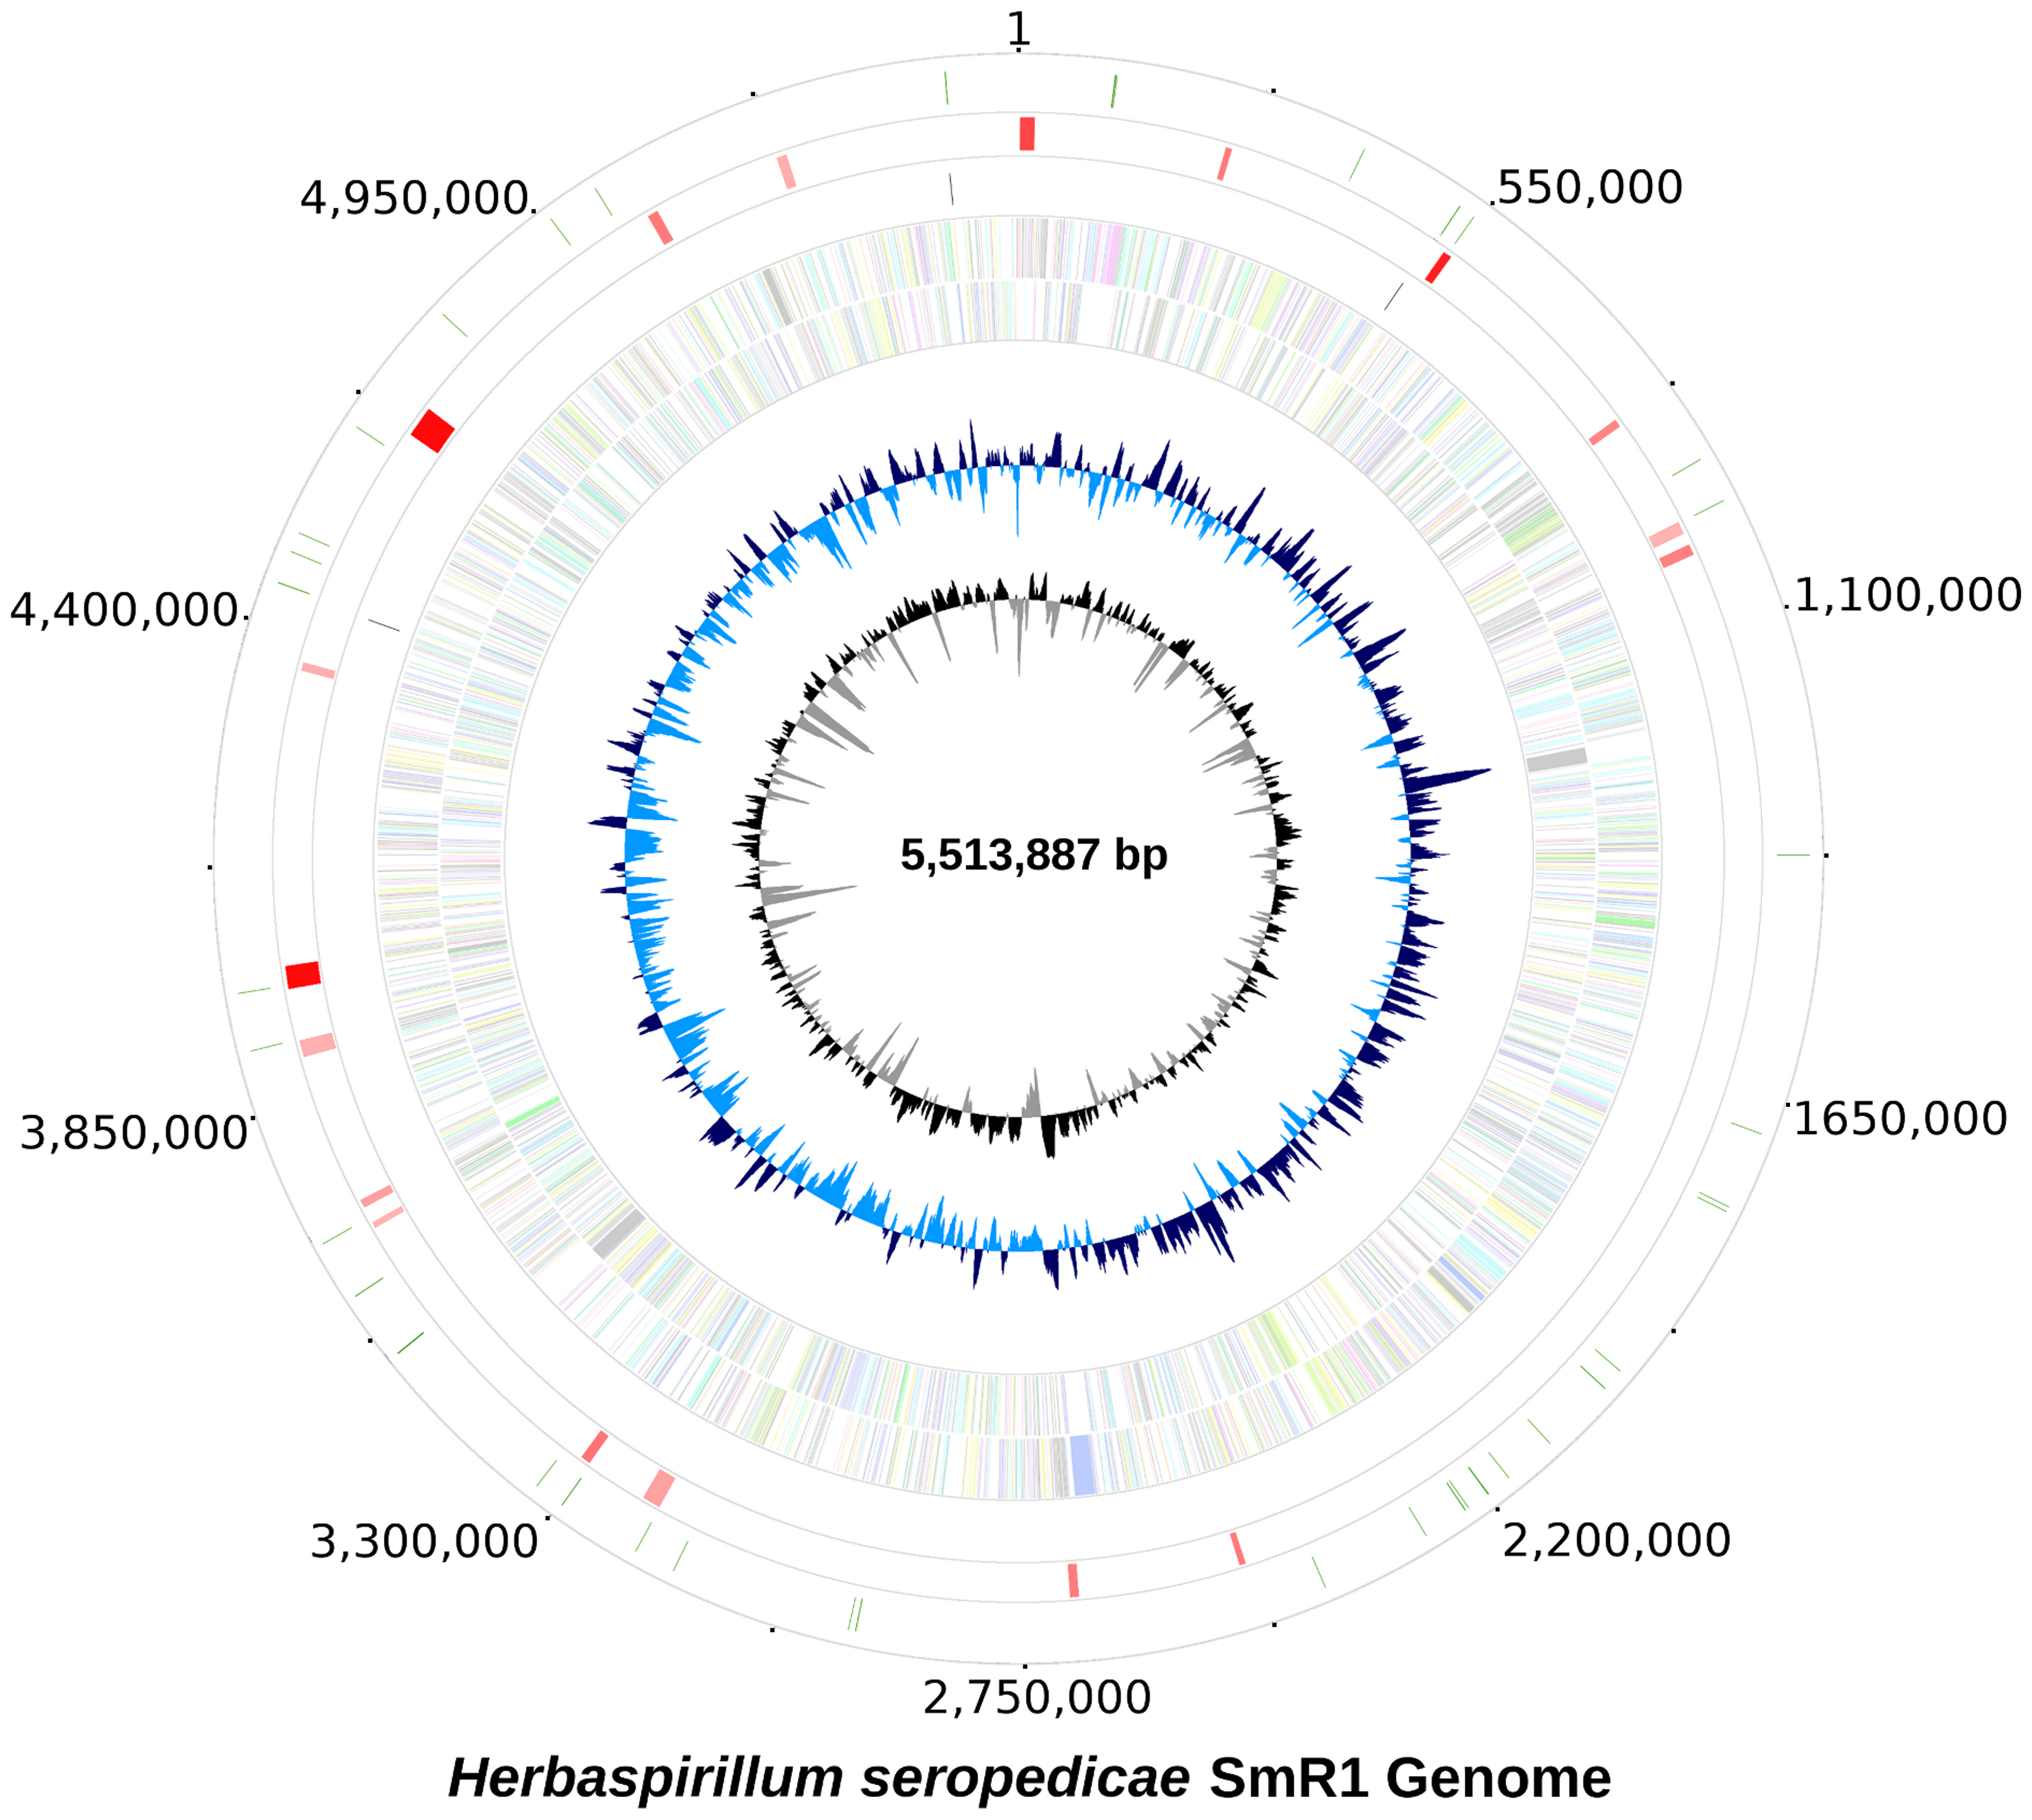 The genome of <i>Herbaspirillum seropedicae</i> SmR1.